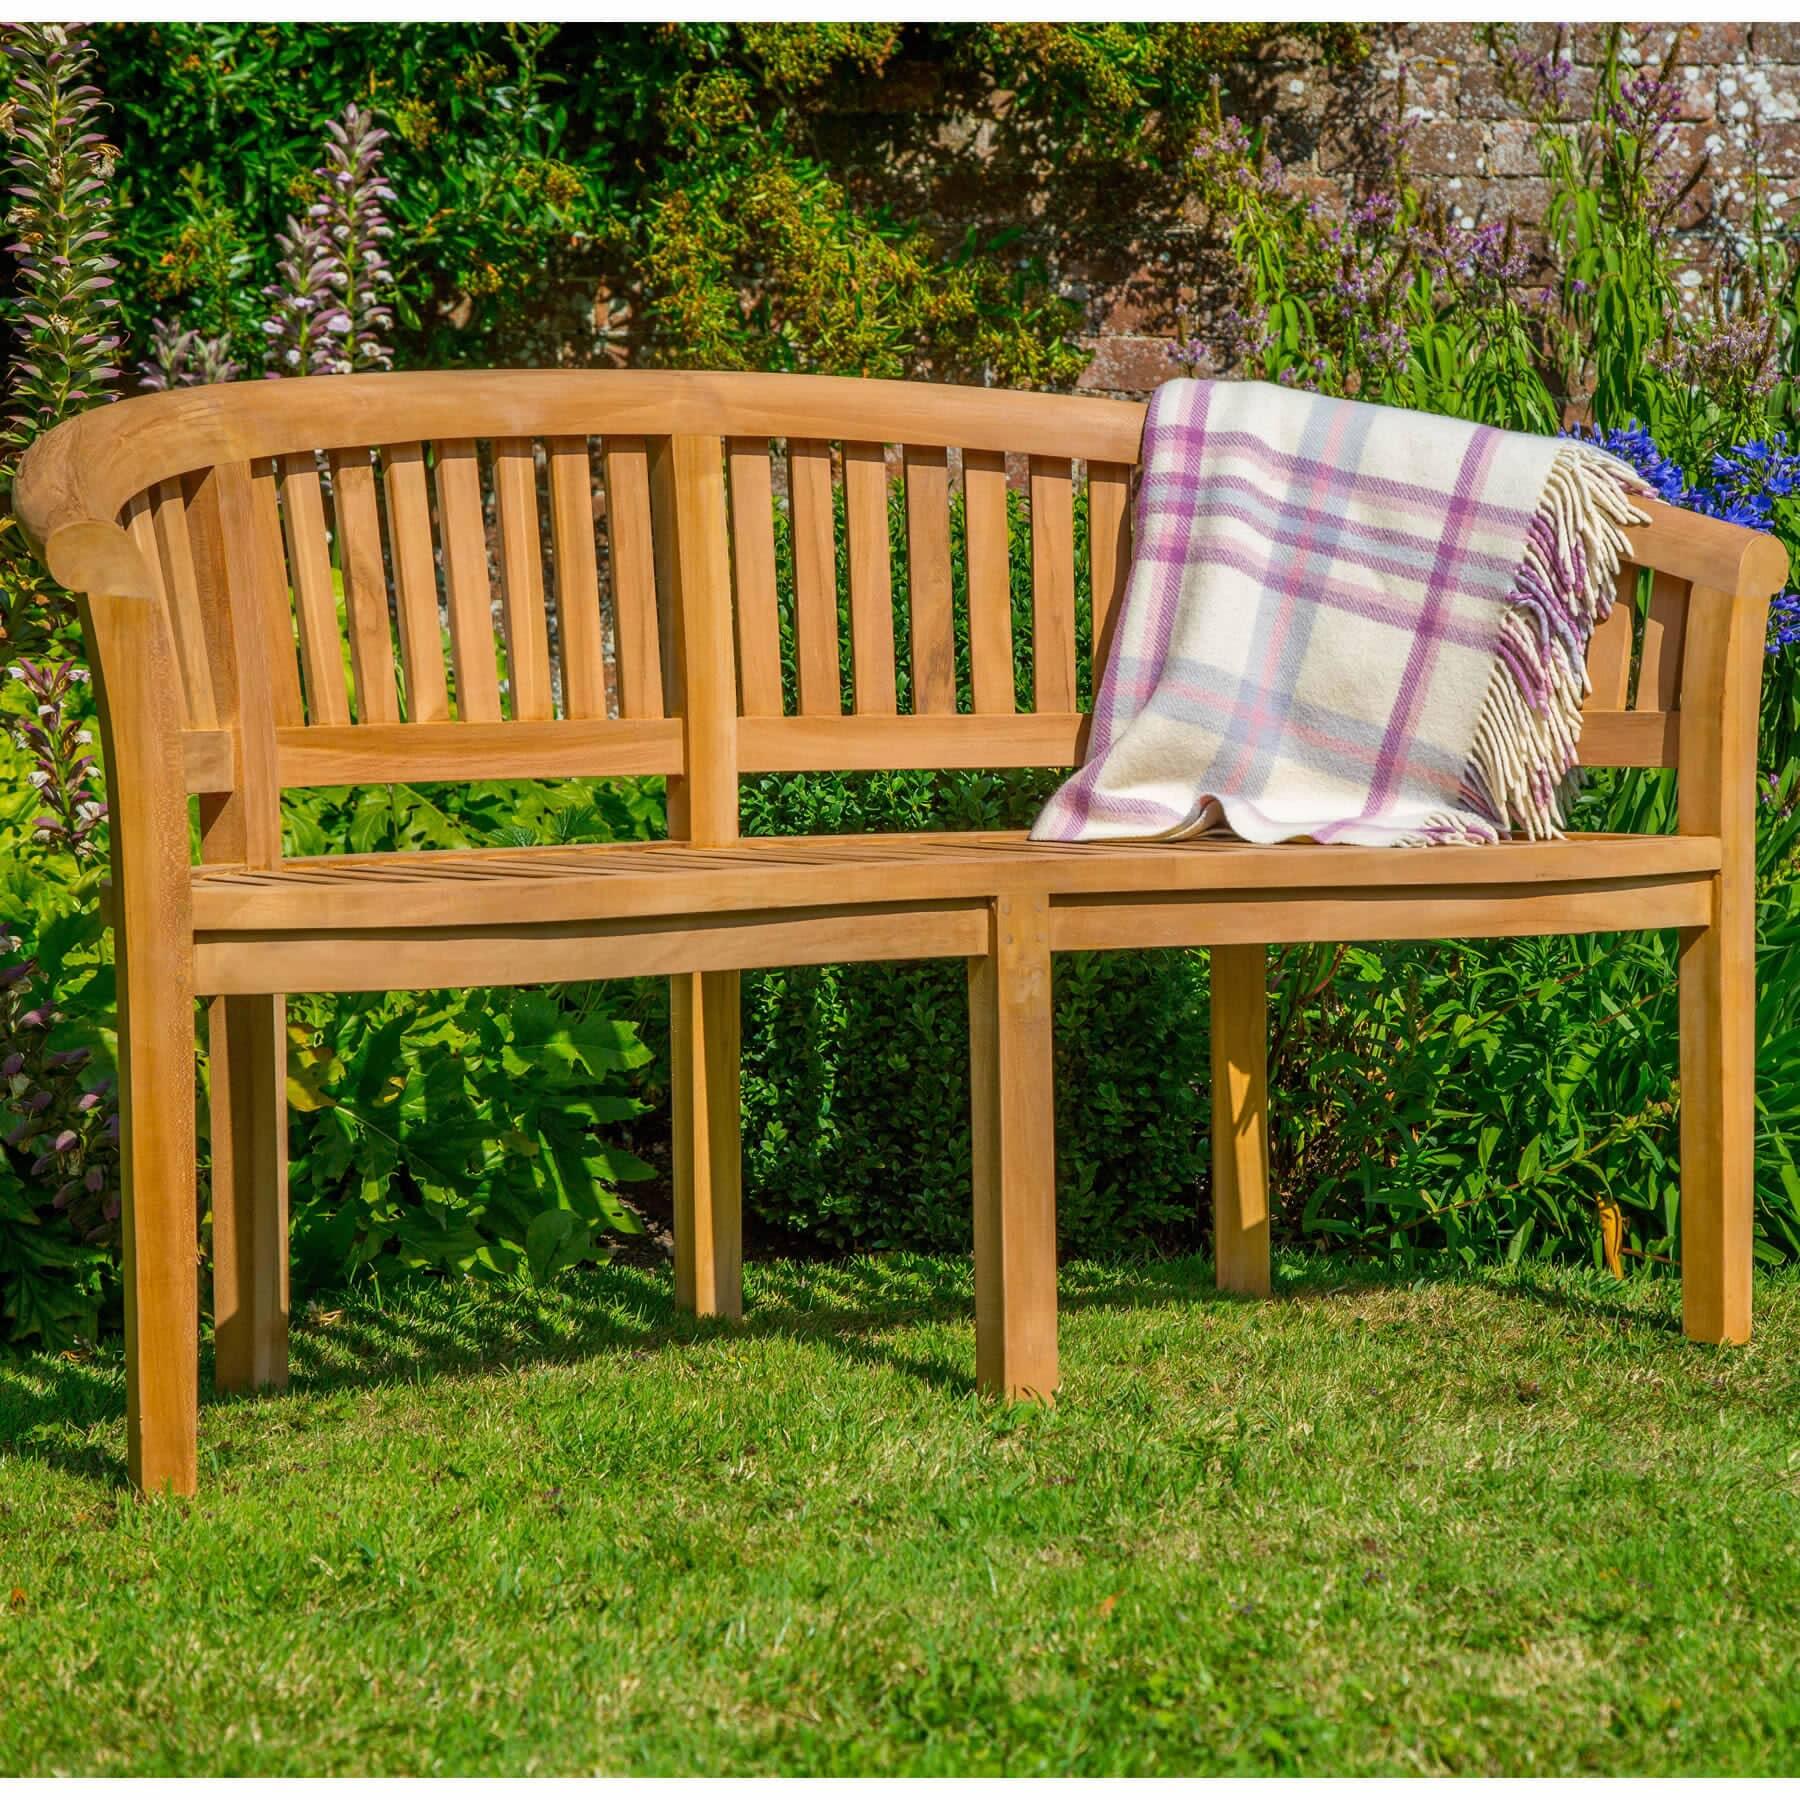 bramblecrest broadway banana bench 8cm hbbn2 garden. Black Bedroom Furniture Sets. Home Design Ideas